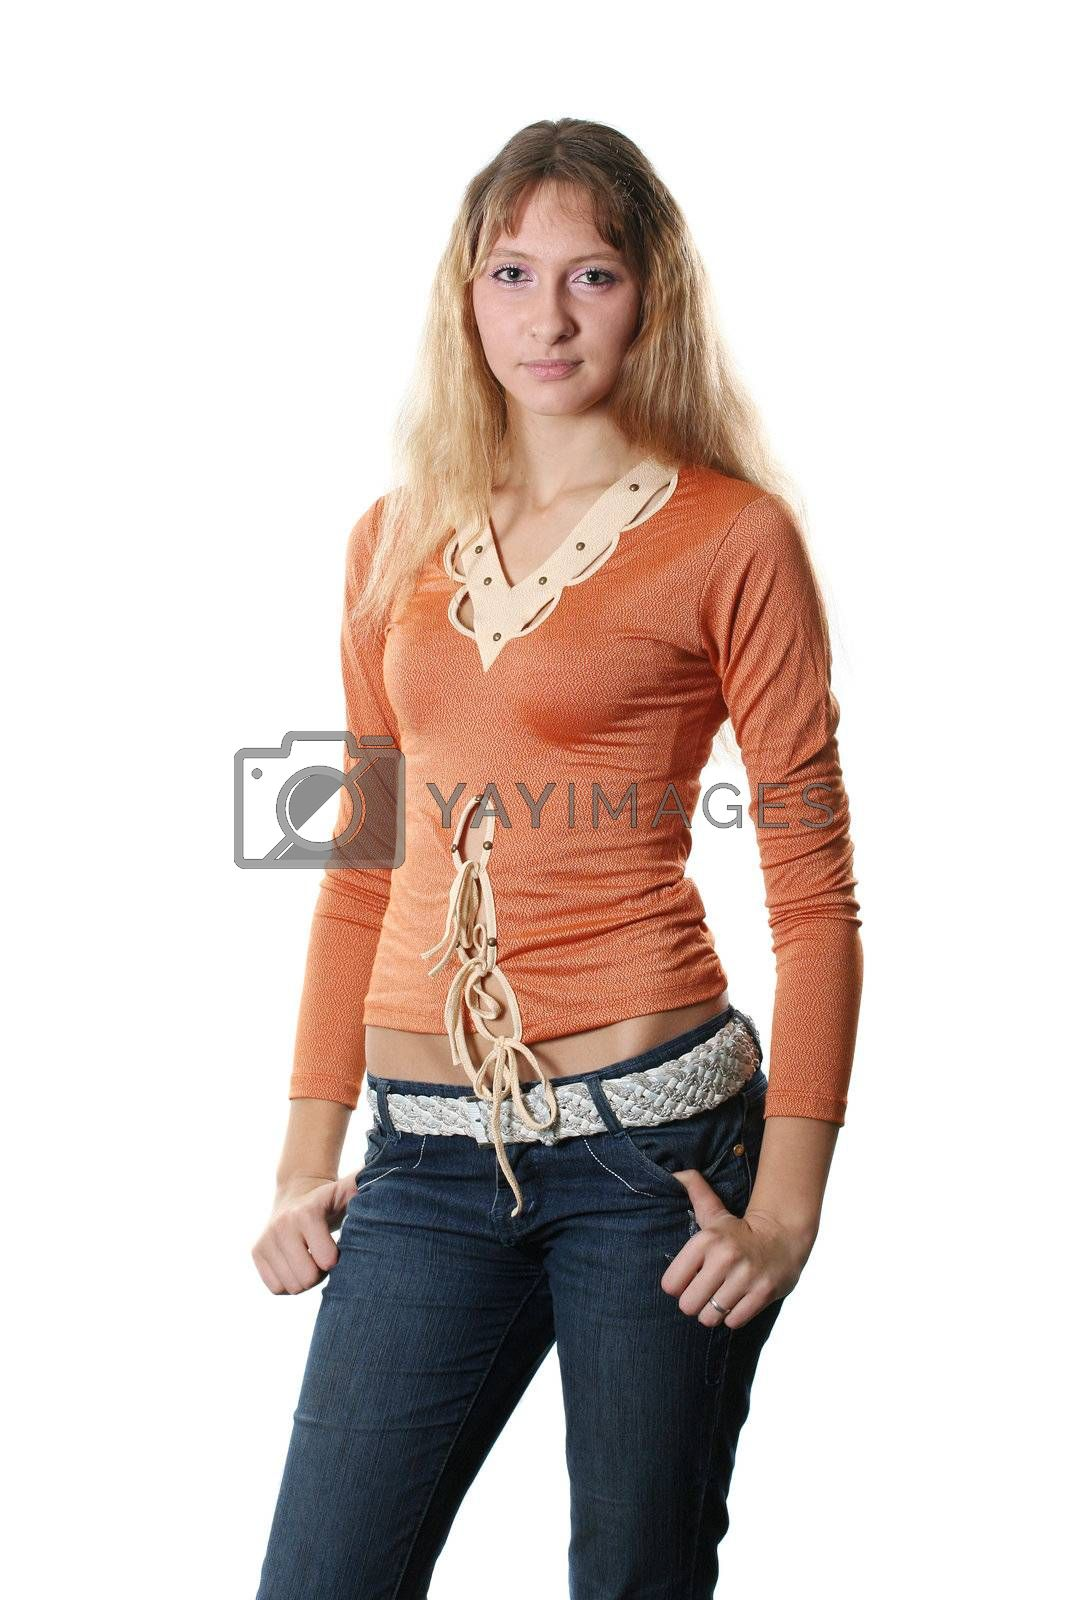 isolated posing model fashion beautiful clothing jeans